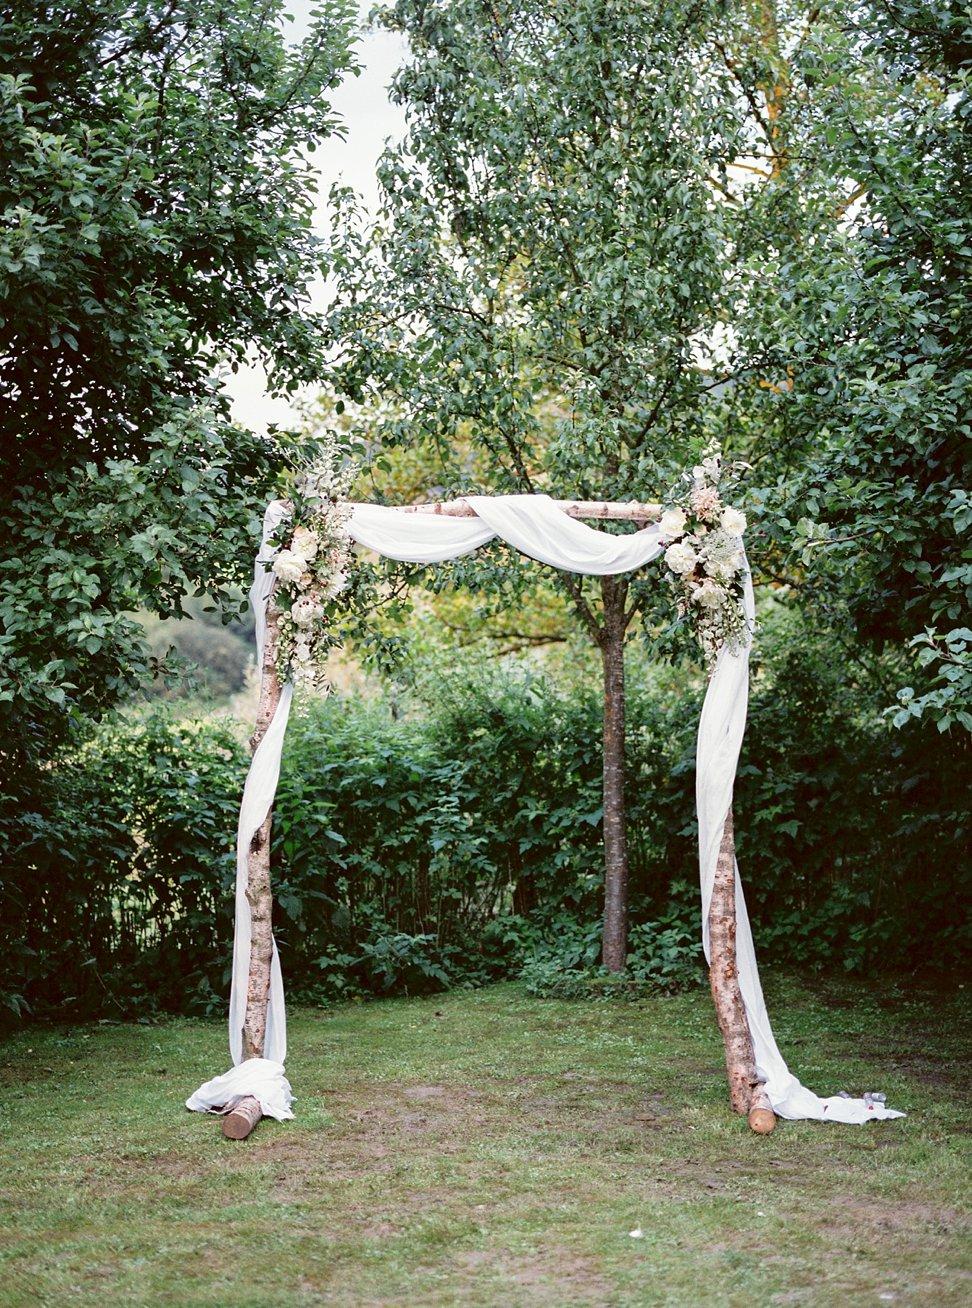 Amanda-Drost-photography-wedding-bruioft-zuid-limburg-hoeve-vernelsveld_0030.jpg